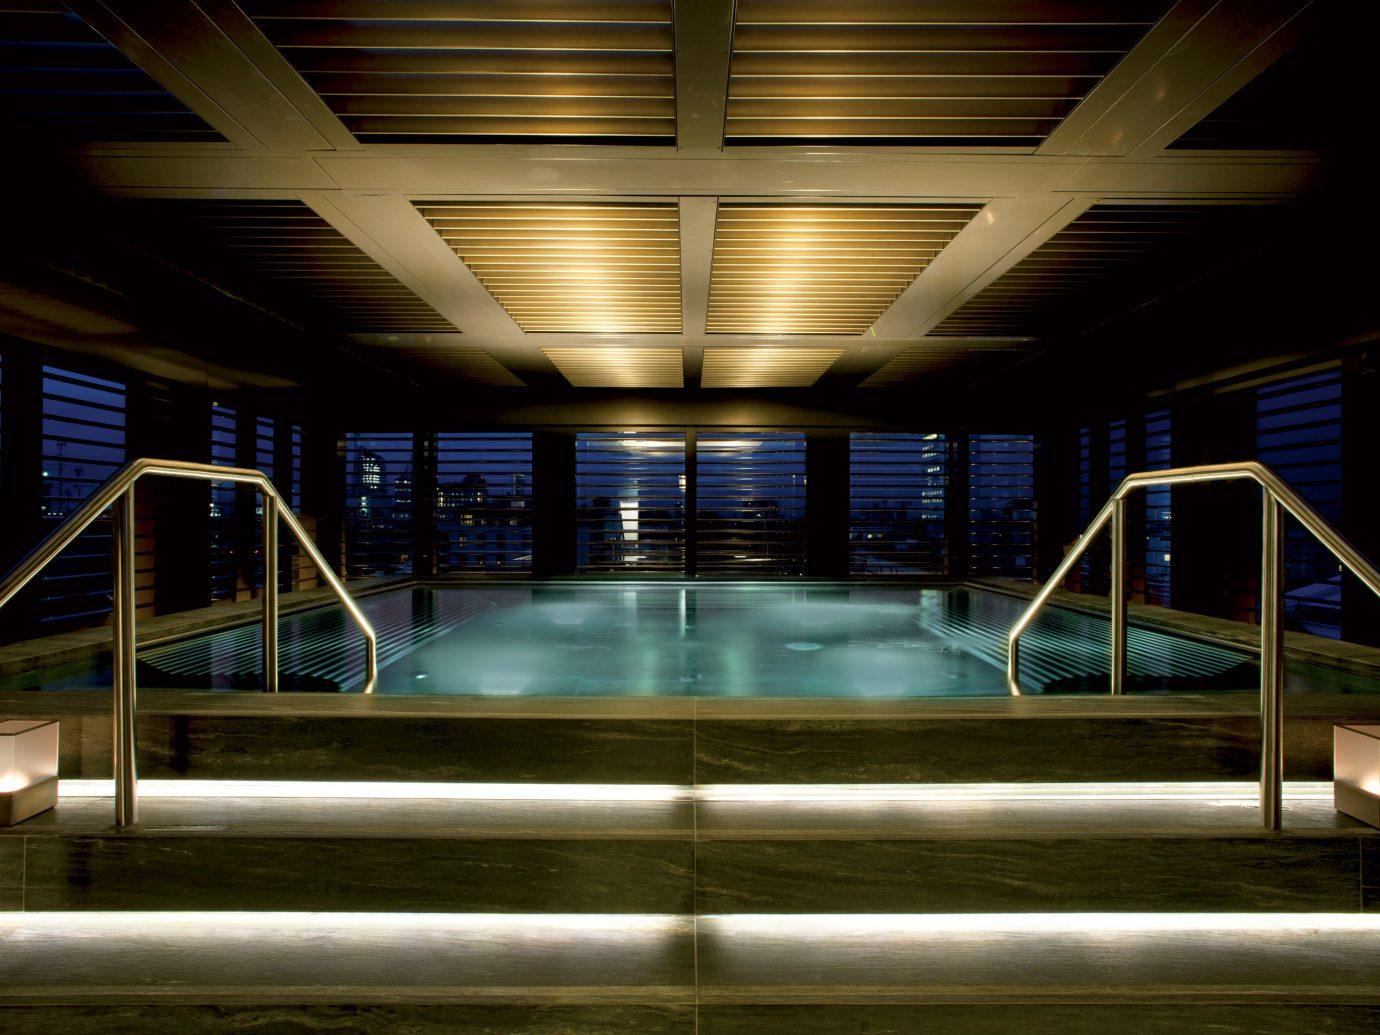 Elegant Hotels Italy Luxury Milan Pool Scenic views indoor ceiling night light reflection Architecture swimming pool lighting interior design subway